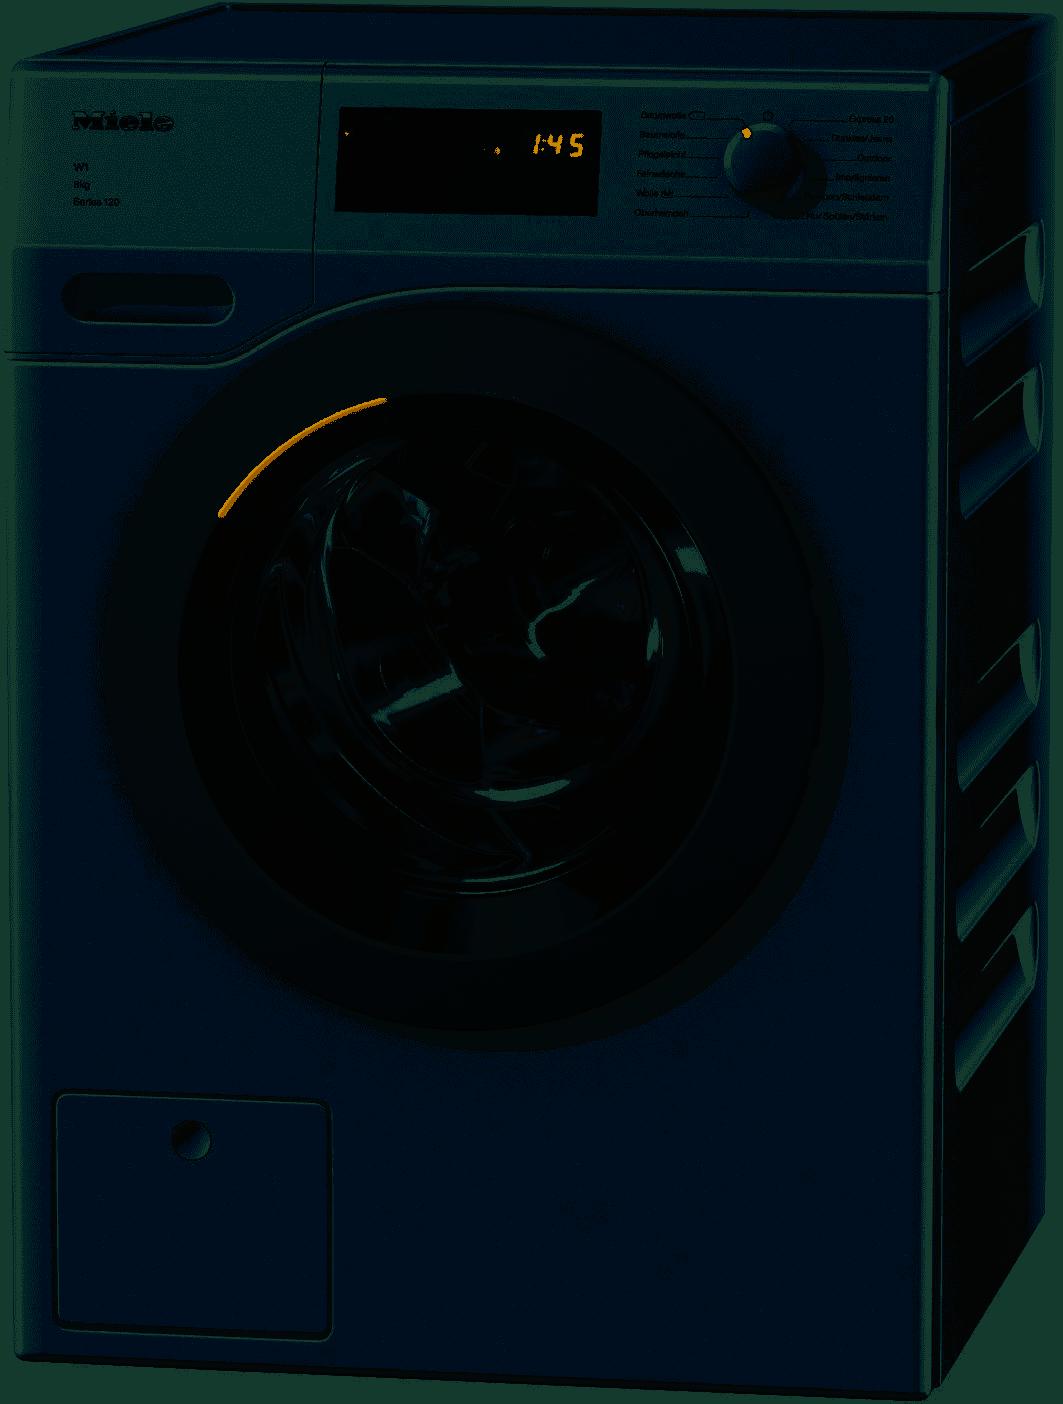 Miele waschmaschine wdd035wps neu waschmaschinen for Gebraucht waschmaschinen